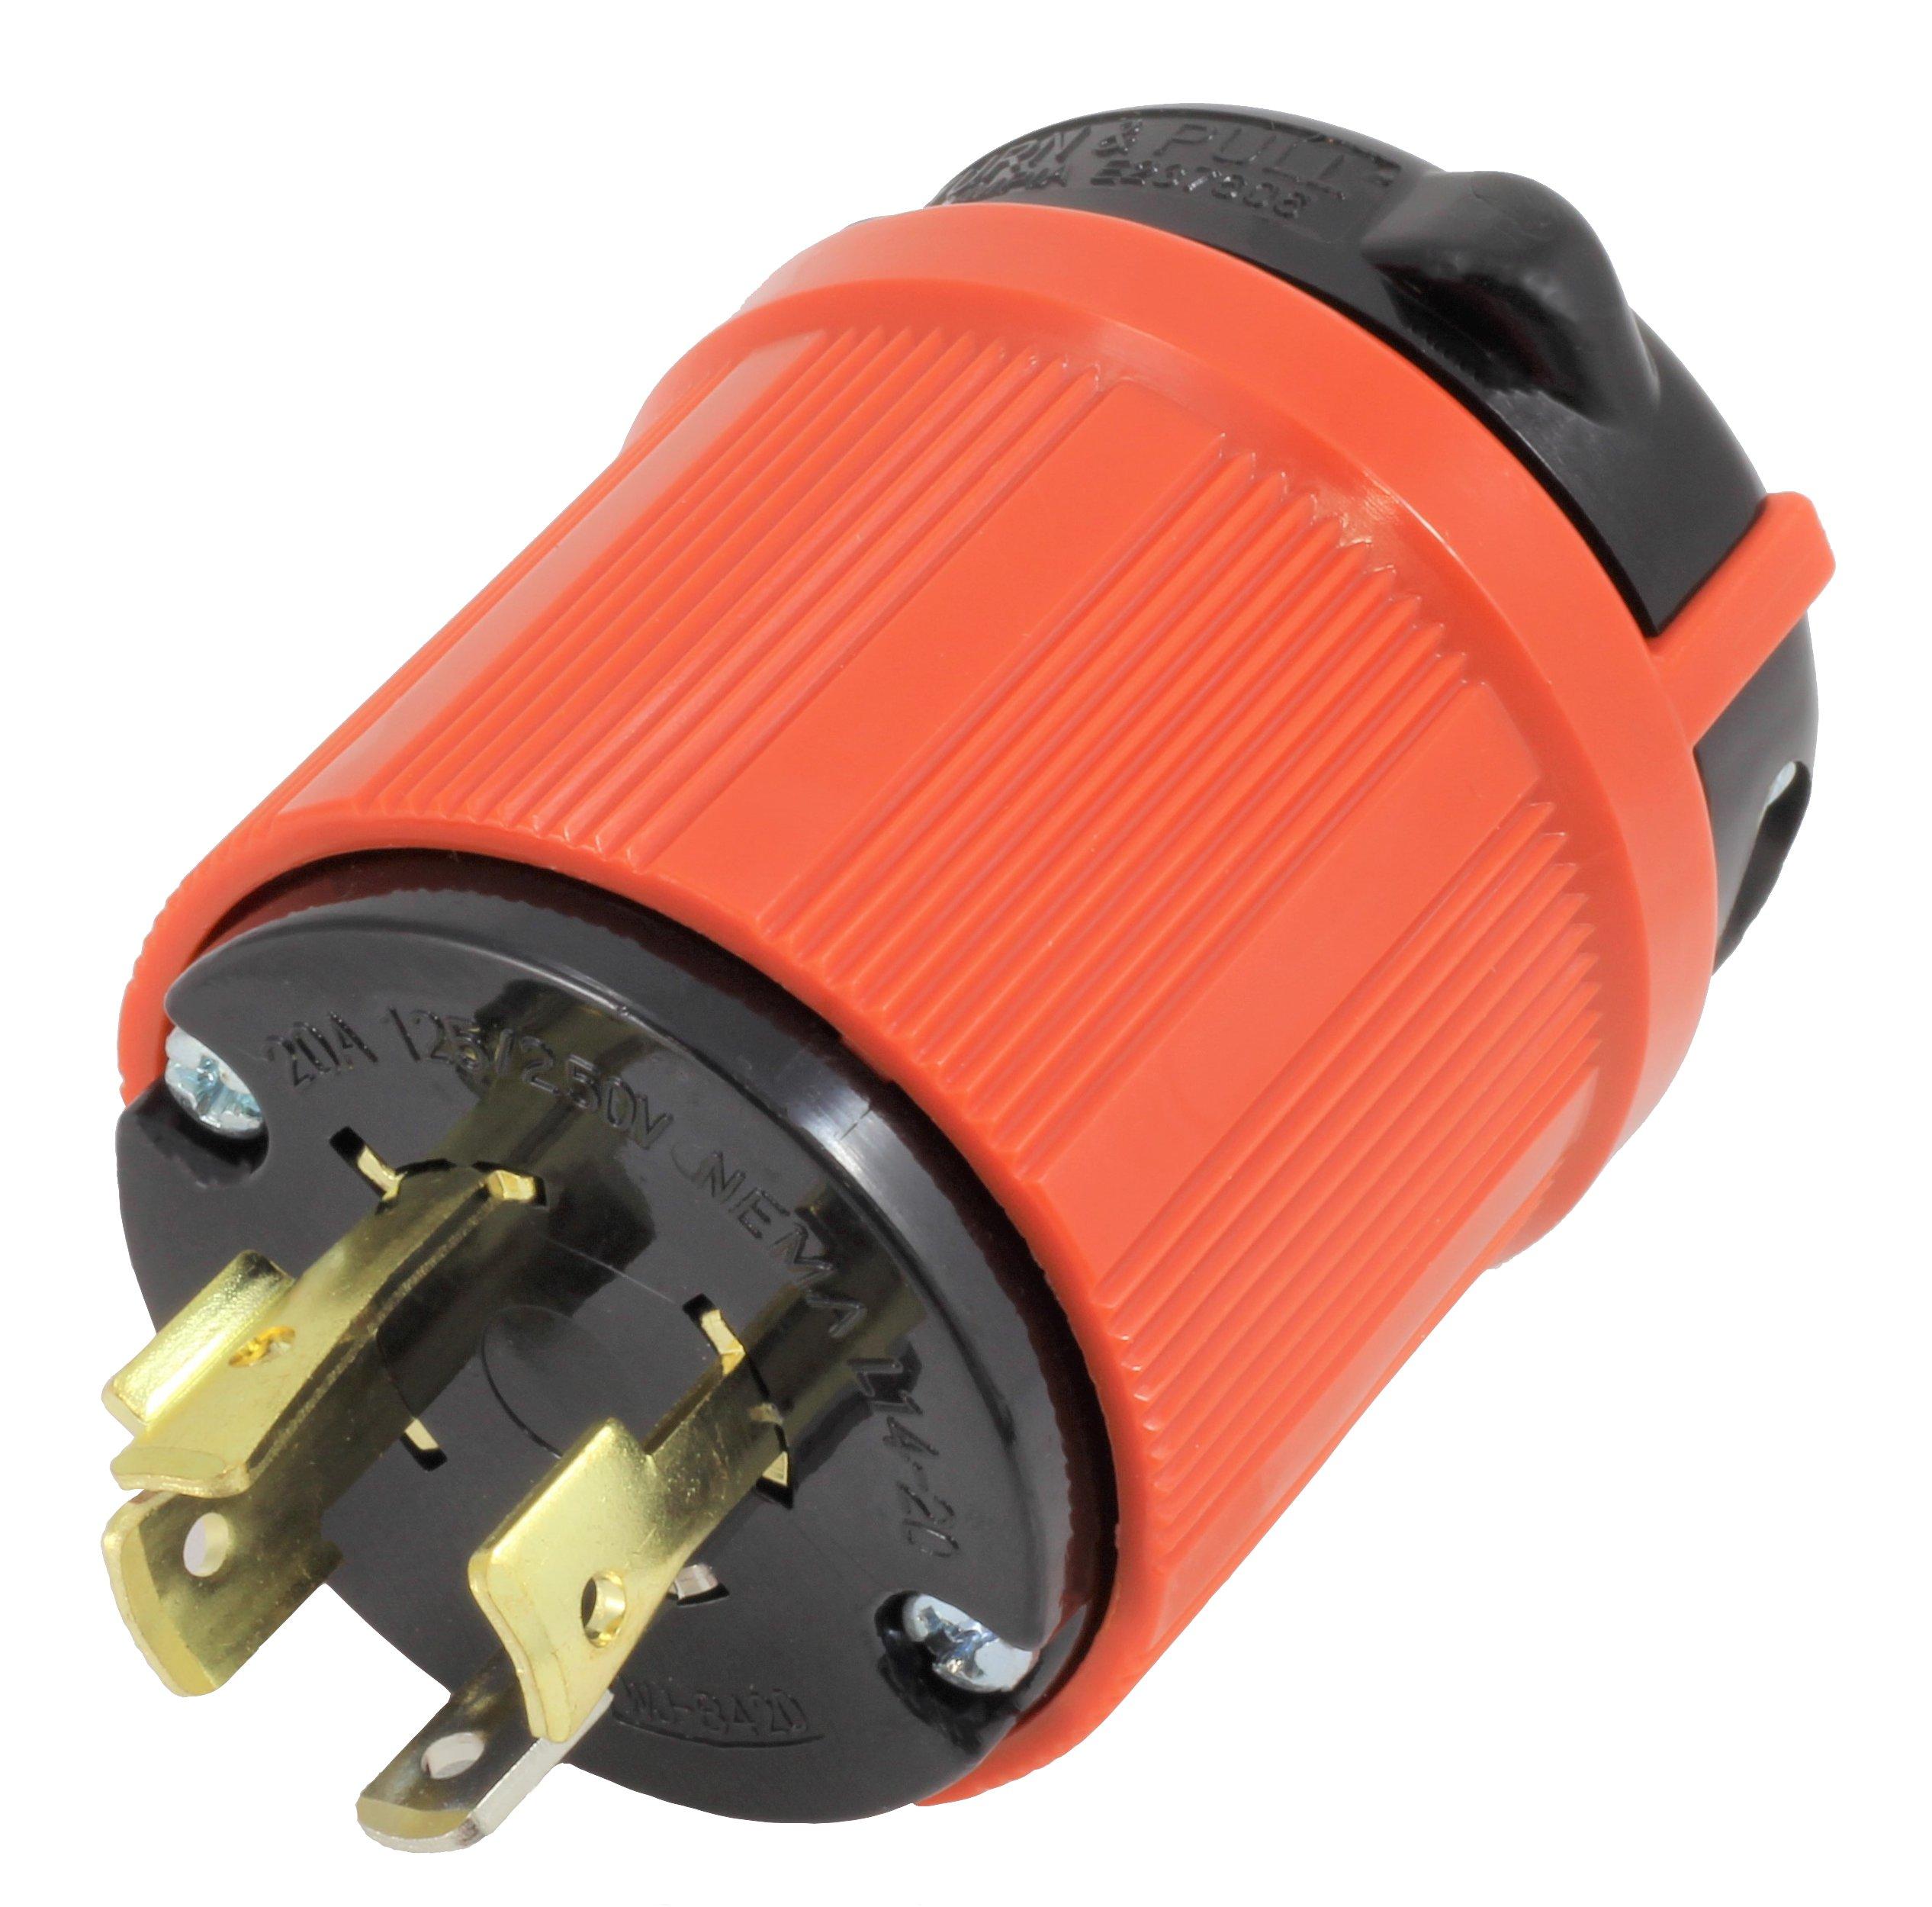 AC WORKS [ASL1420P] NEMA L14-20P 20Amp 125/250Volt 4Prong Locking Male Plug With UL, C-UL Approval